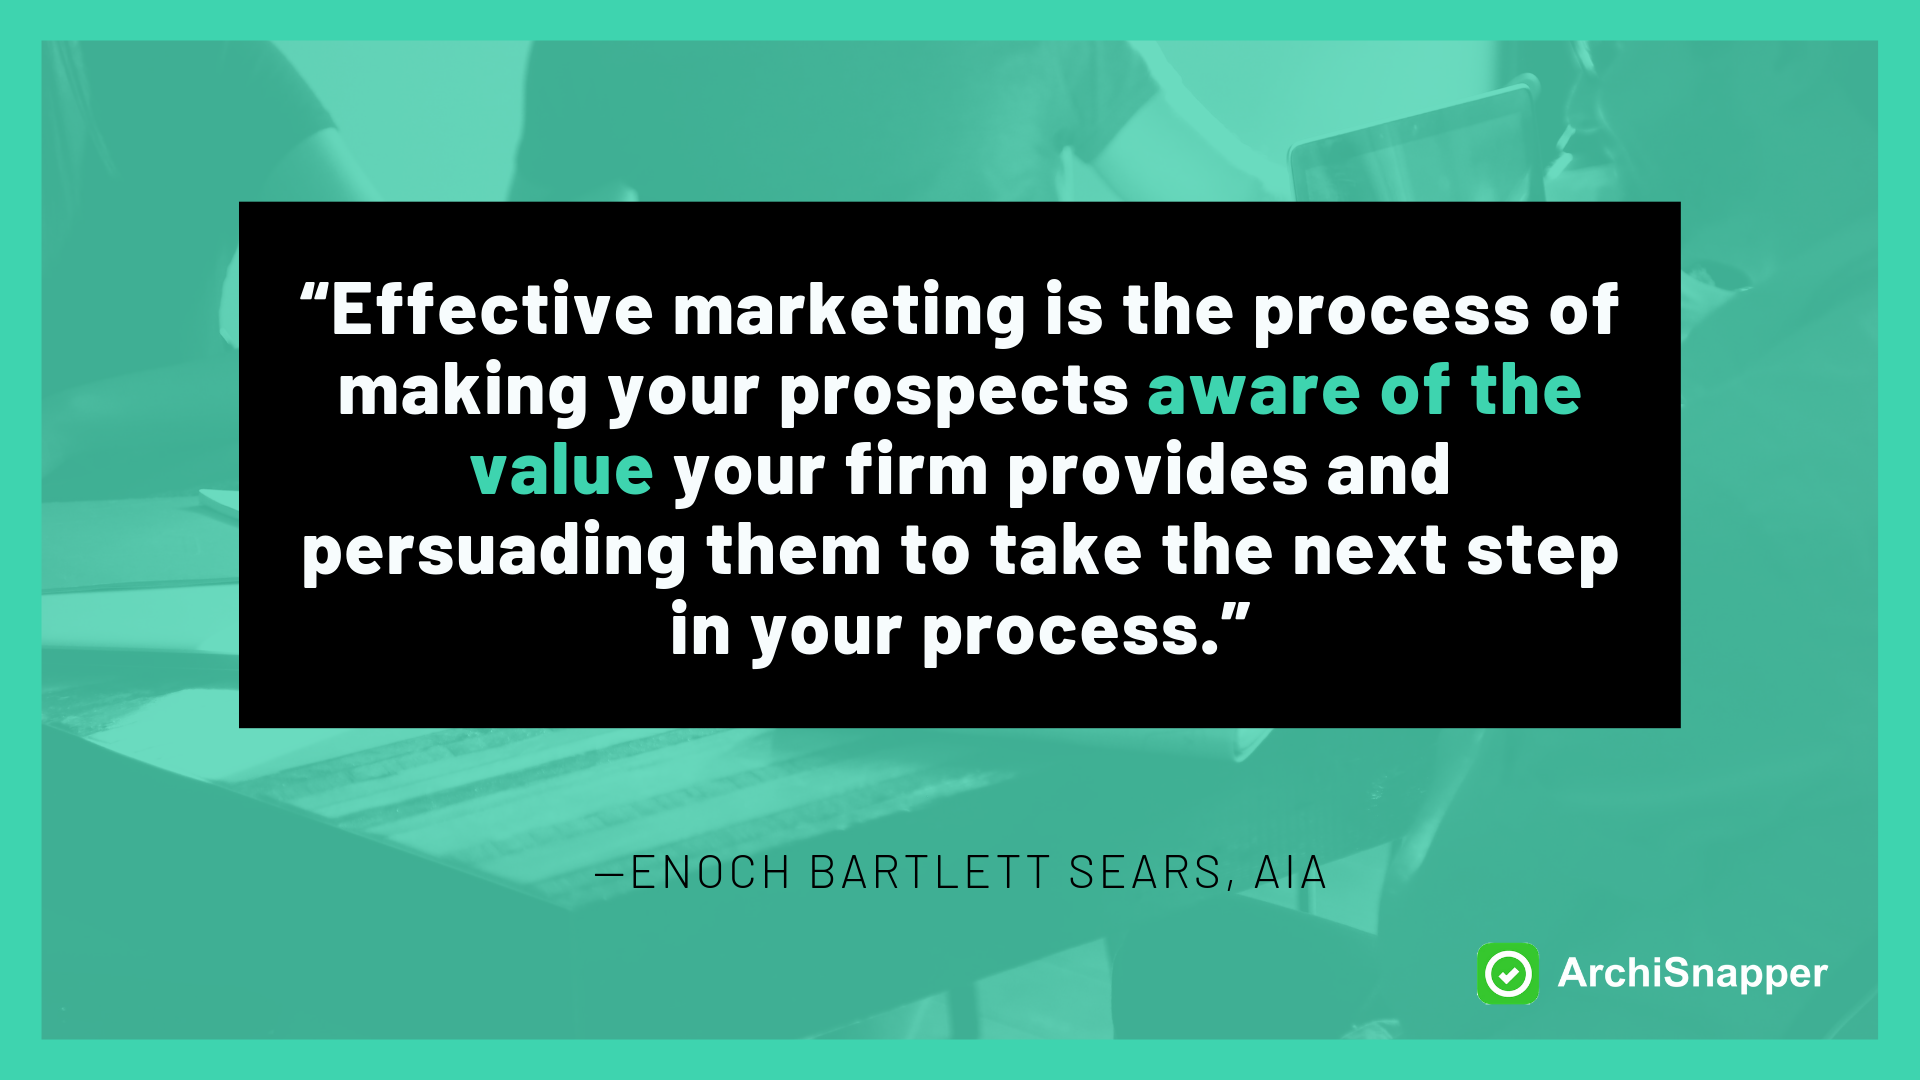 Enoch Bartlett Sears, AIA on marketing | Archisnapper